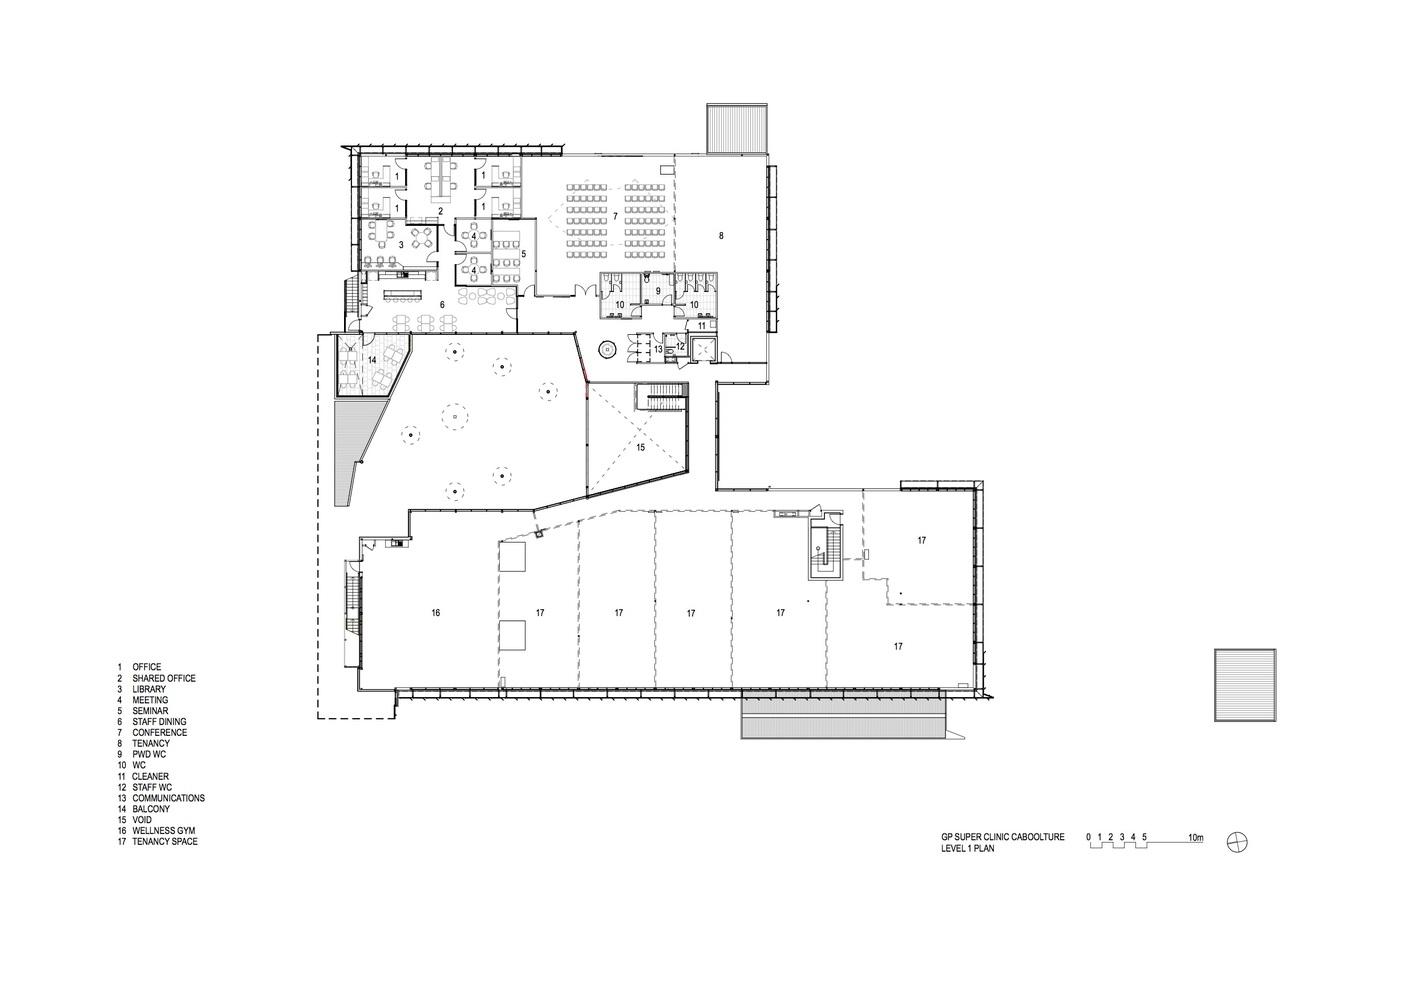 caboolture gp super clinic first floor plan [ 1415 x 1000 Pixel ]